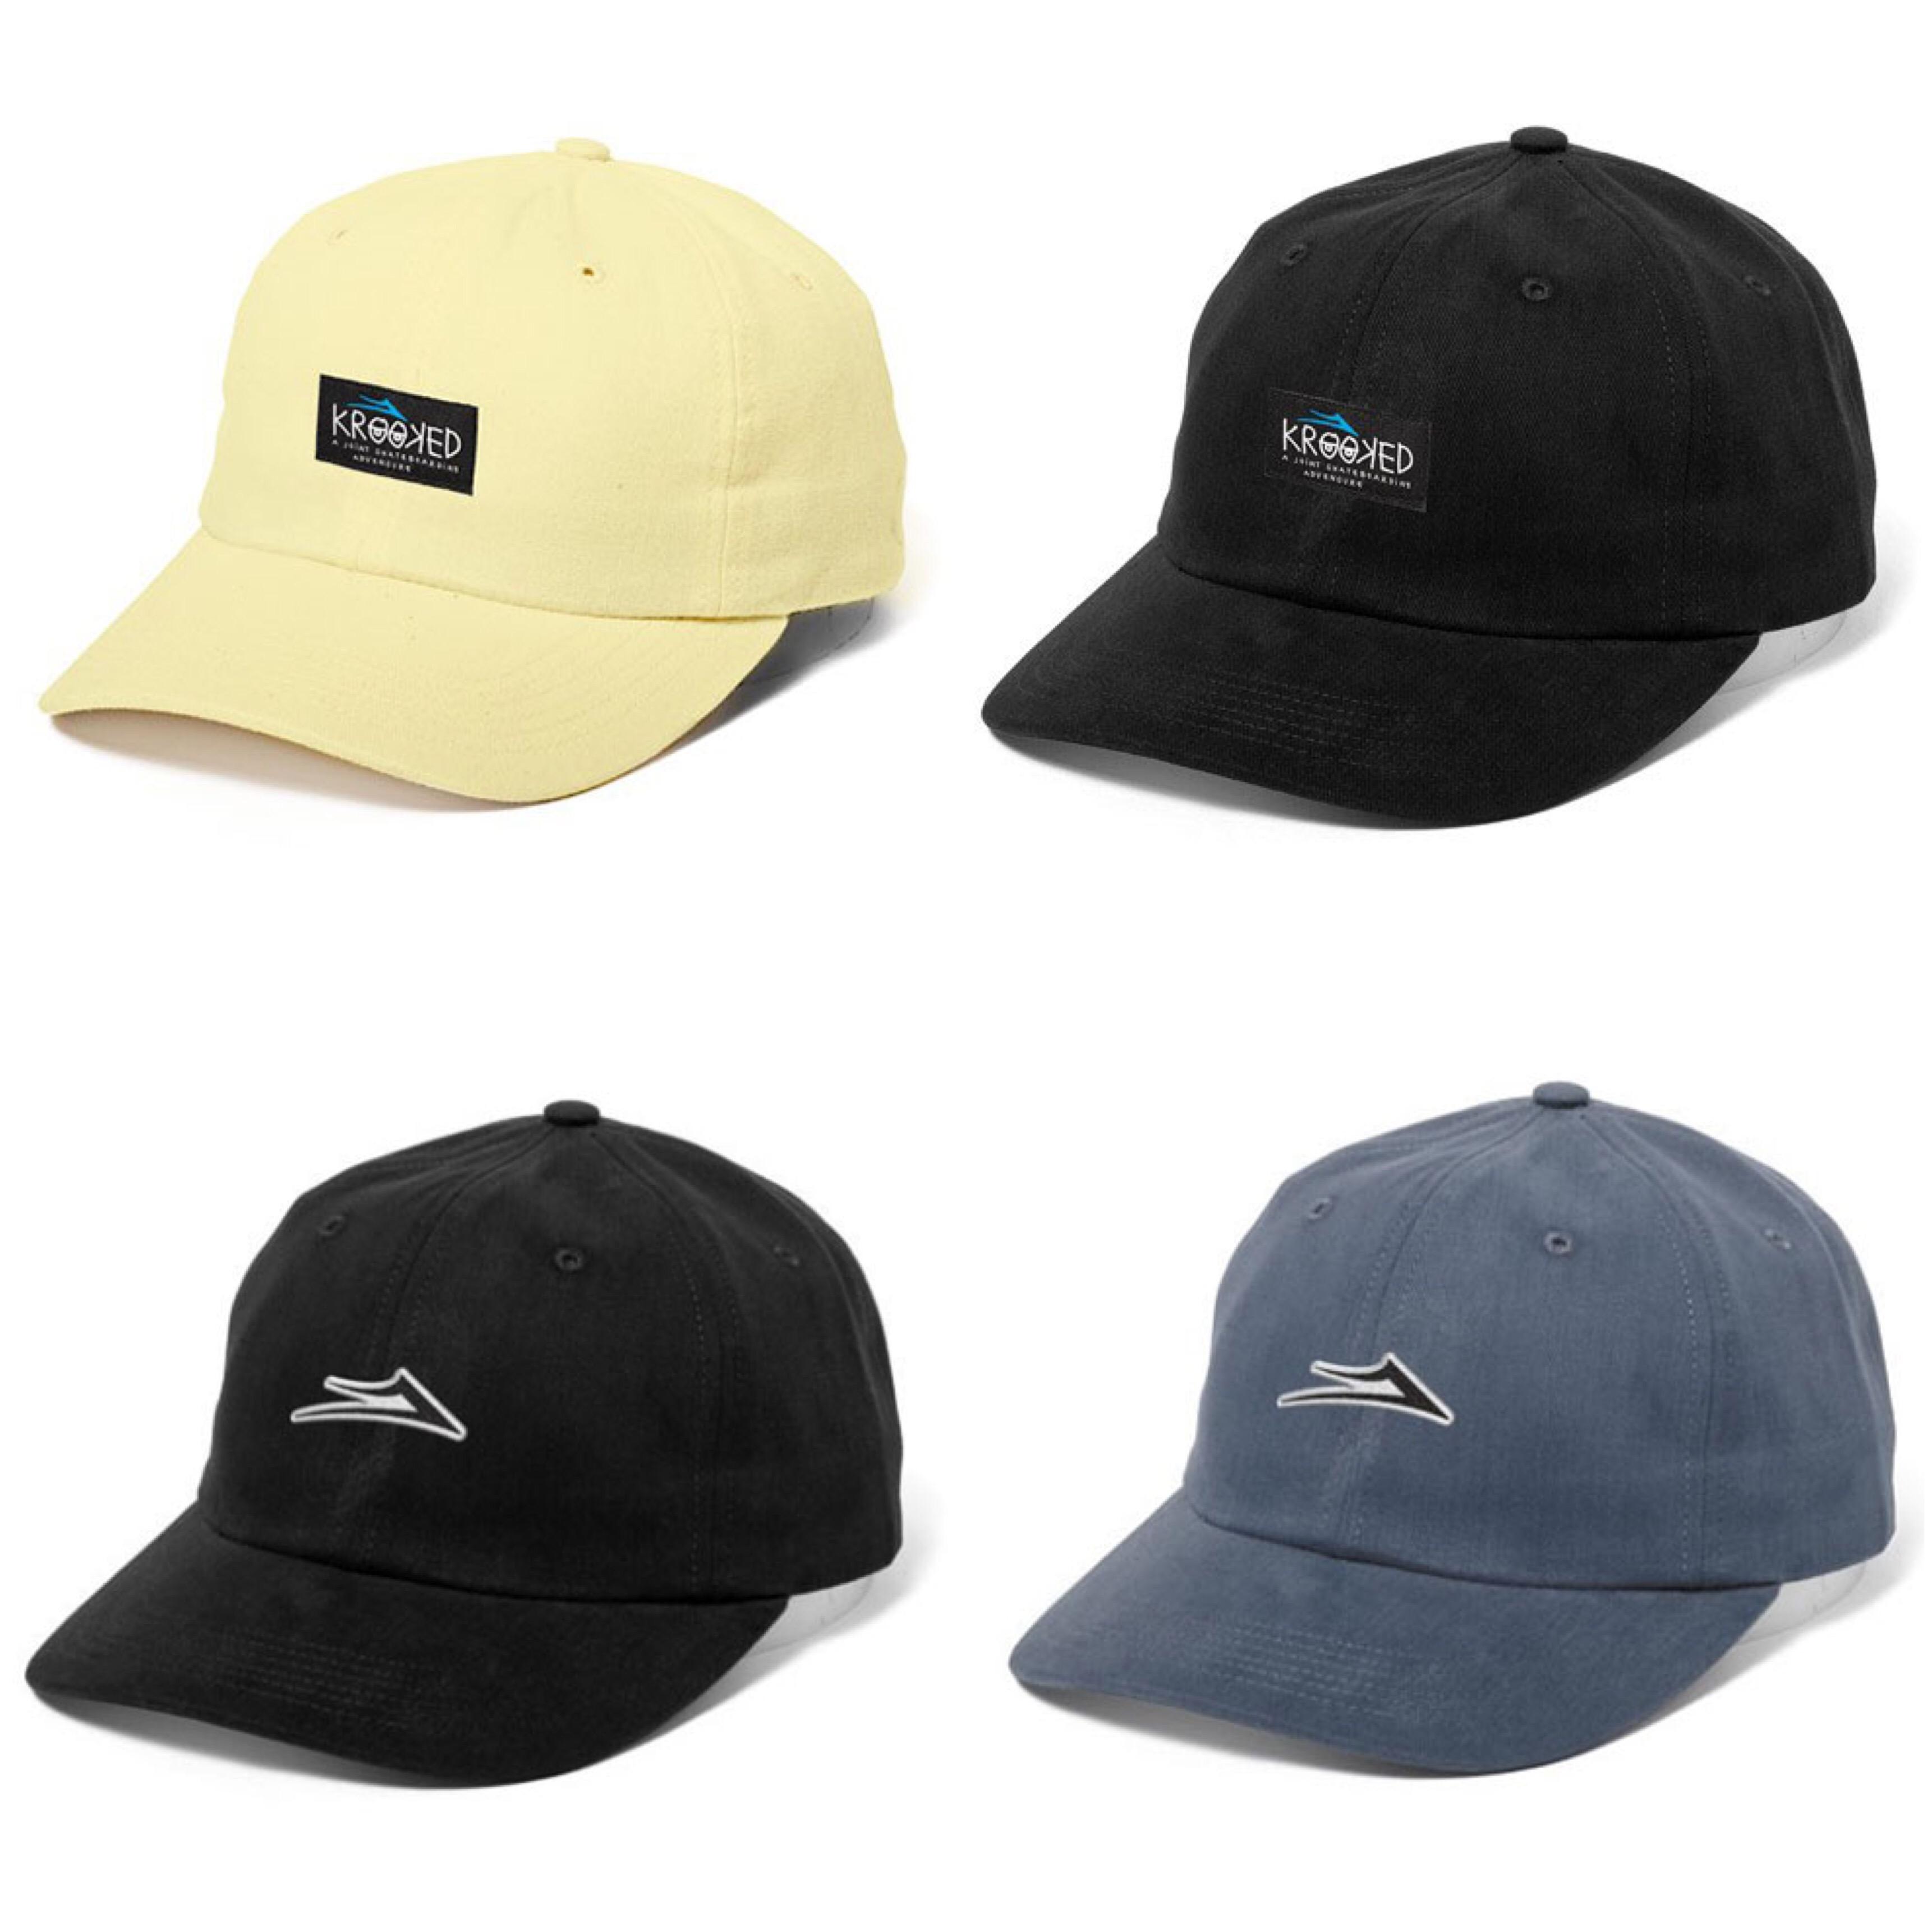 New Lakai X Krooked dad hats!  26  28 – Central Board Shop 69d561ed4d3